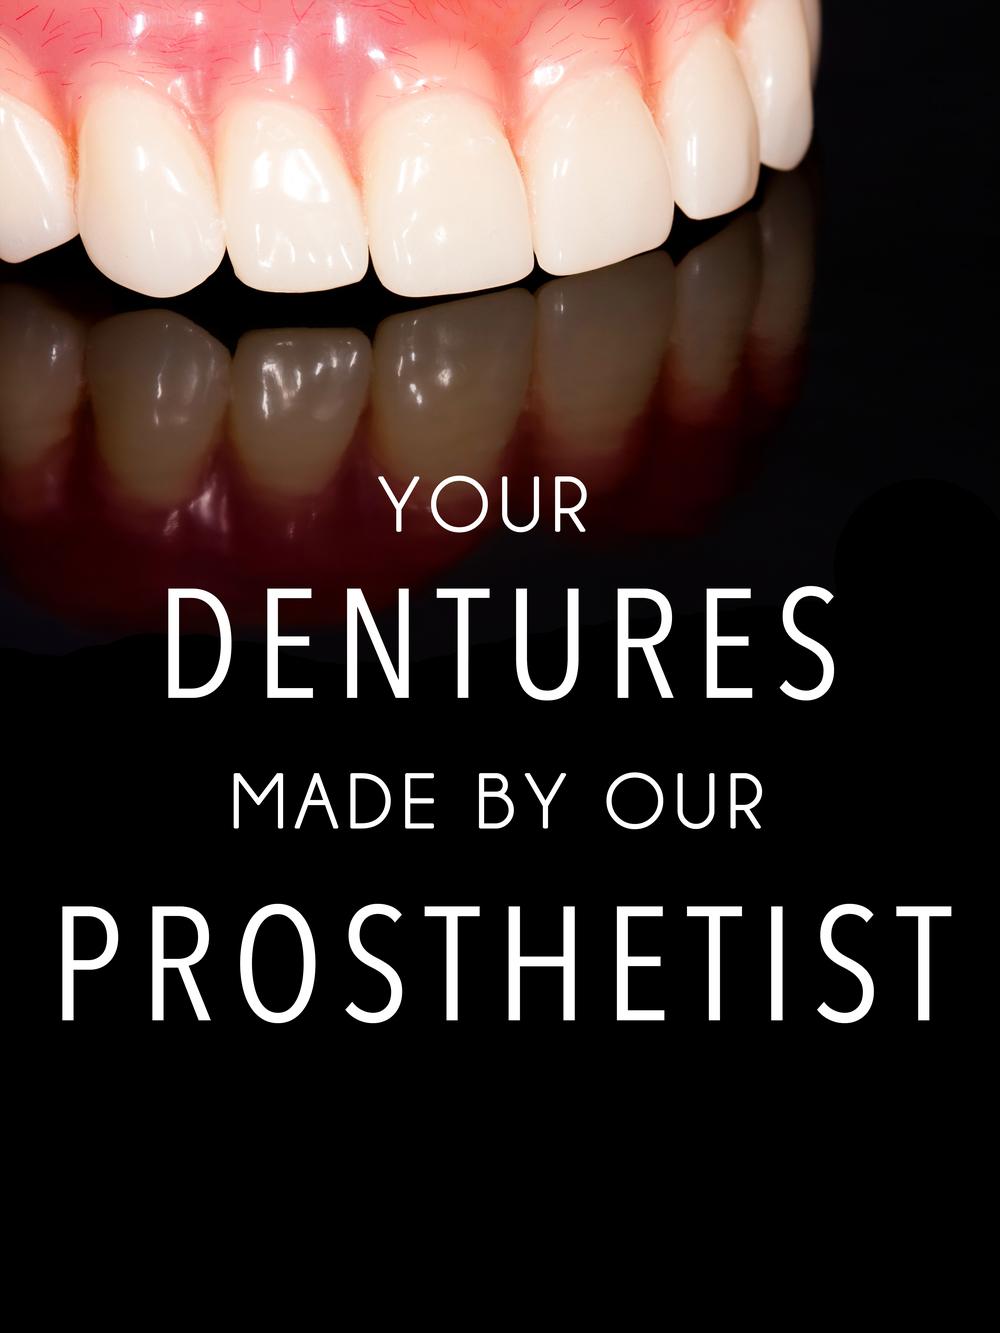 Dollarphotoclub_50727644 prosthetist.jpg